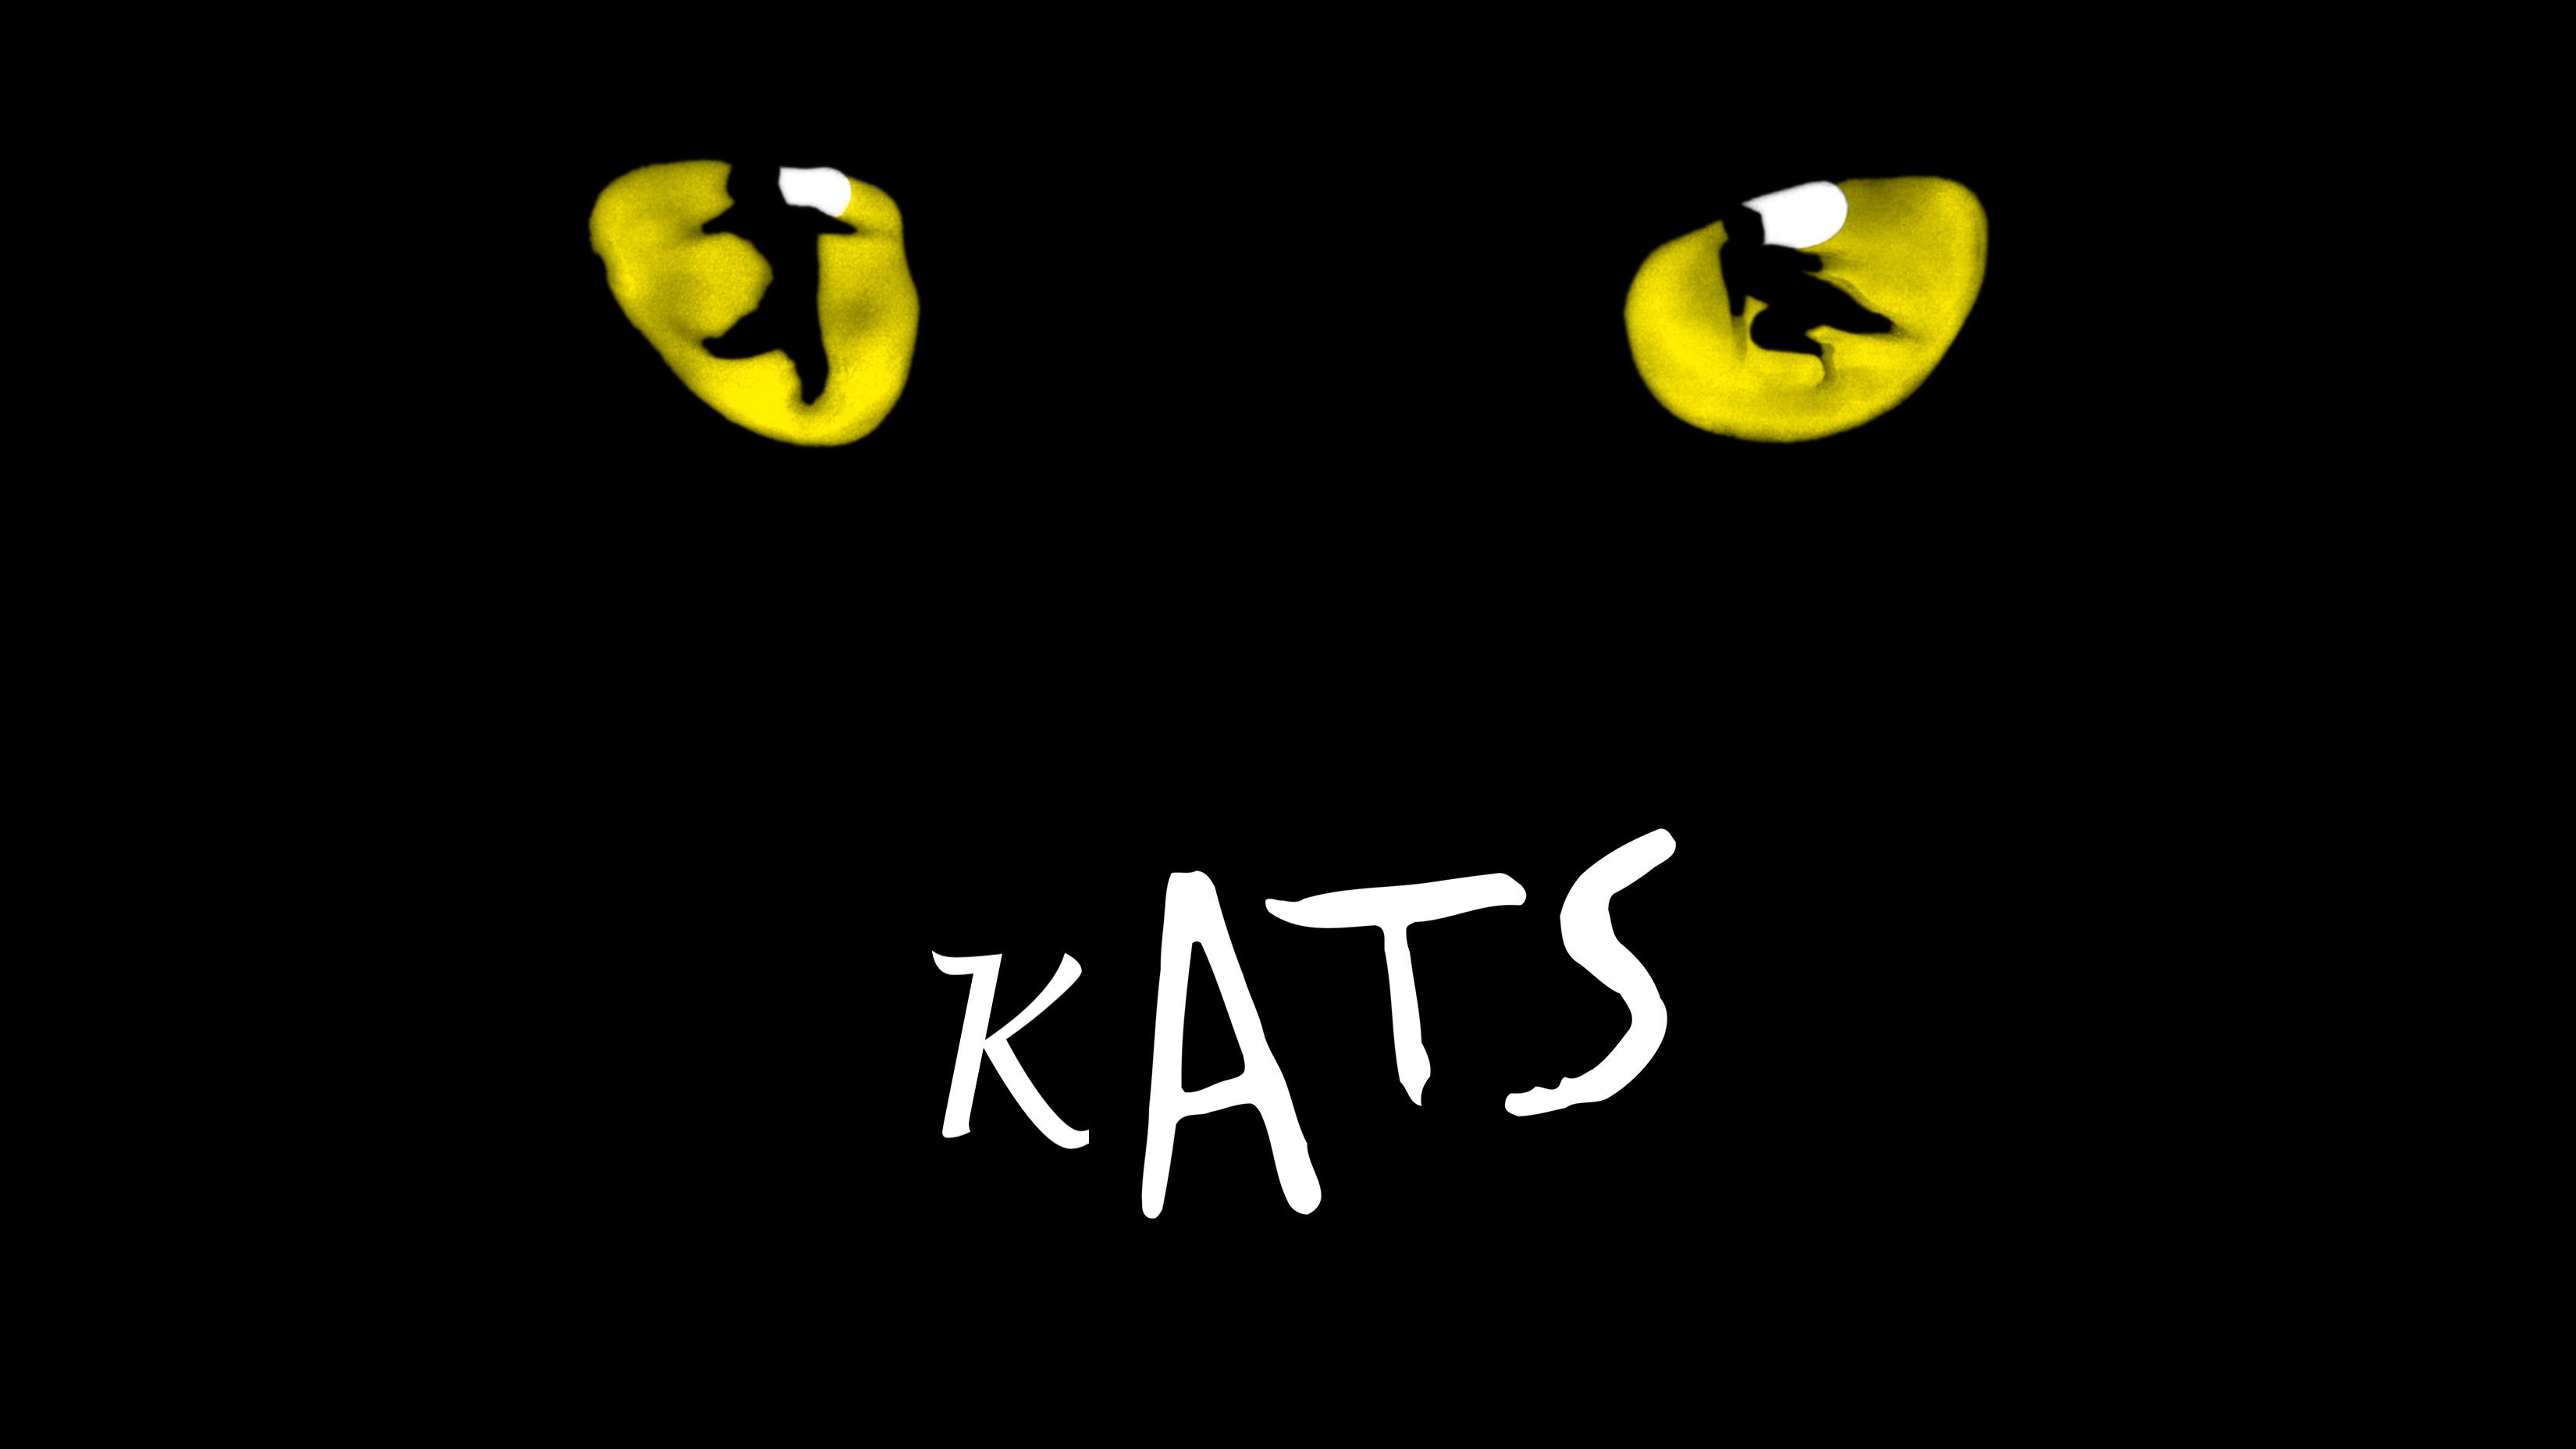 Cats-logo-16x9